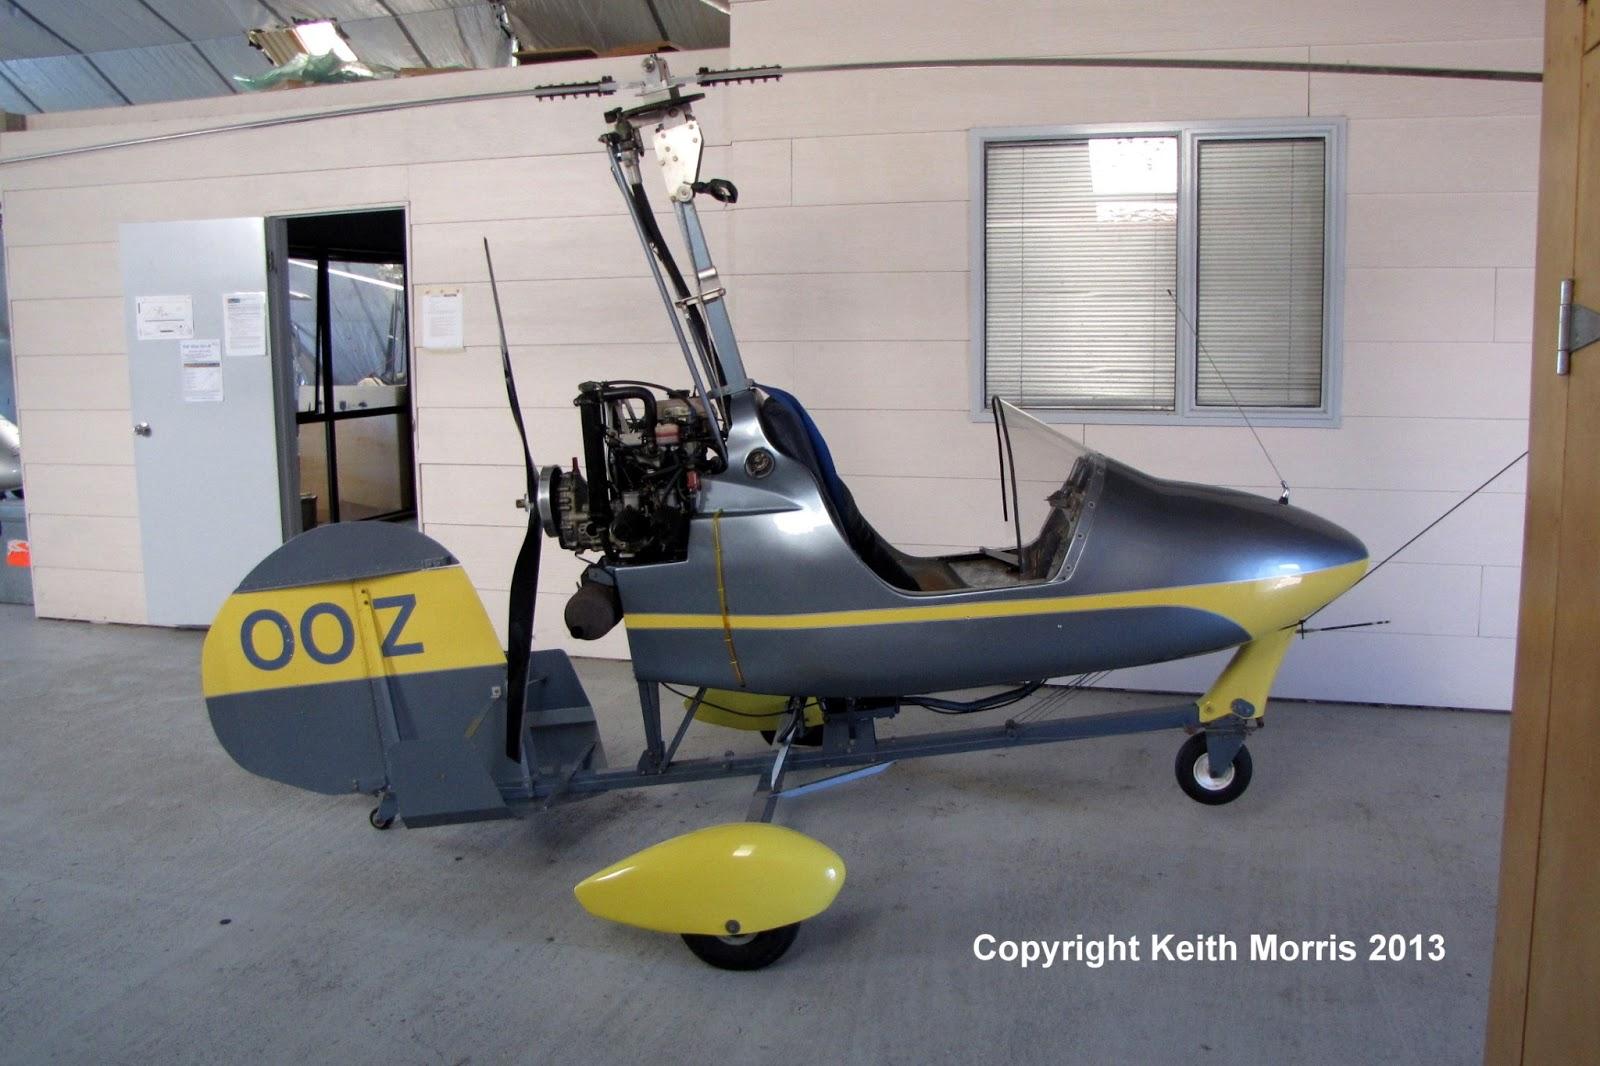 NZ Civil Aircraft: Montgomerie Bensen B8MR Gyrocopter at ...